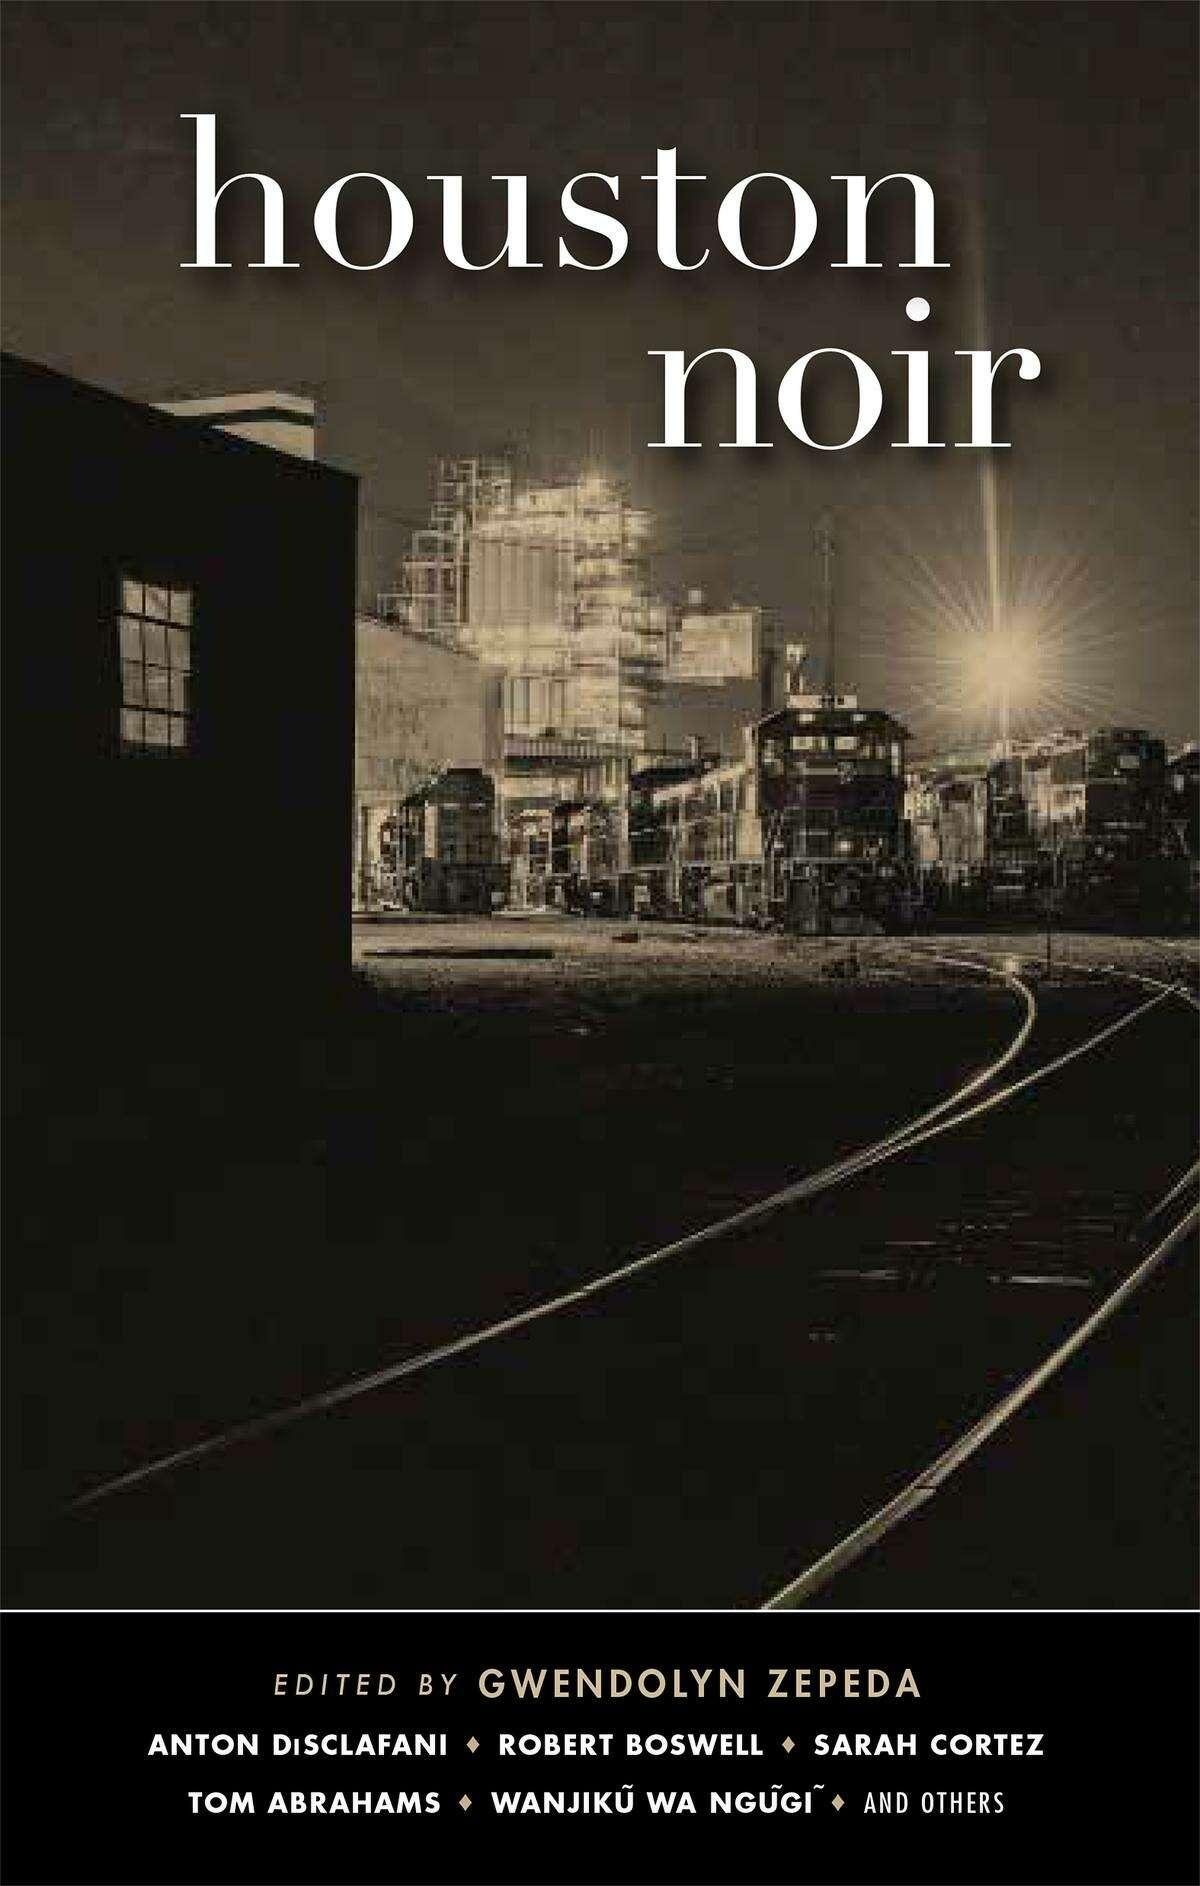 The cover for Akashic Books' 'Houston Noir' short story compilation